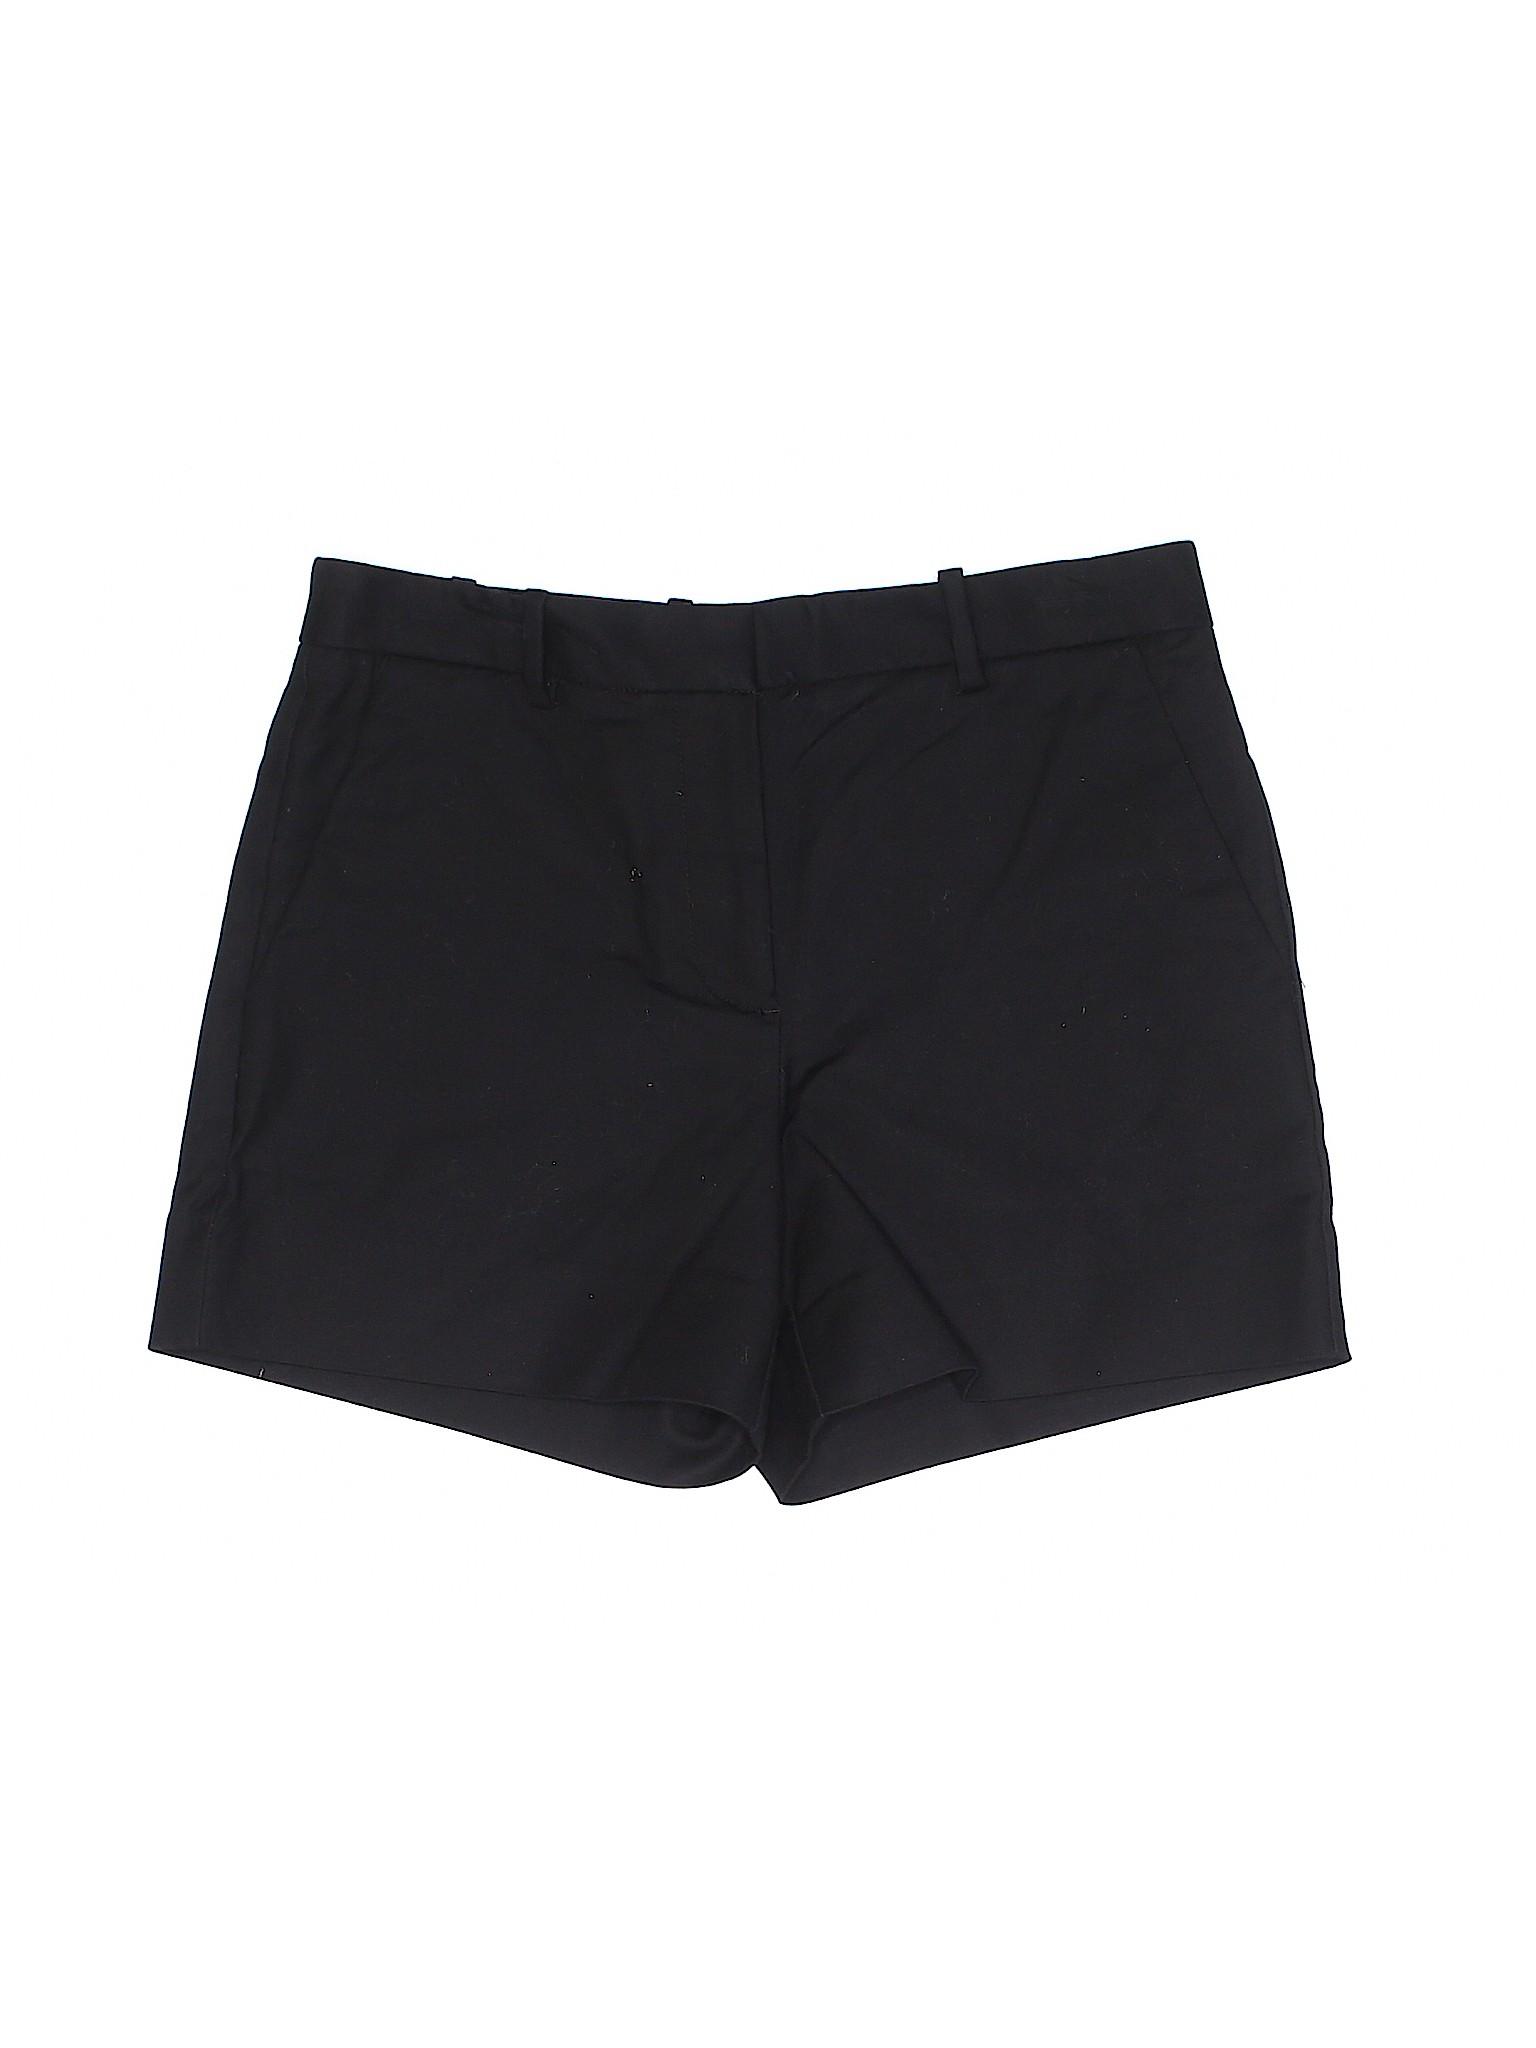 Dressy Shorts winter Leisure winter Leisure Shorts winter Leisure Gap Shorts Dressy Dressy Gap Gap 00f8qrw